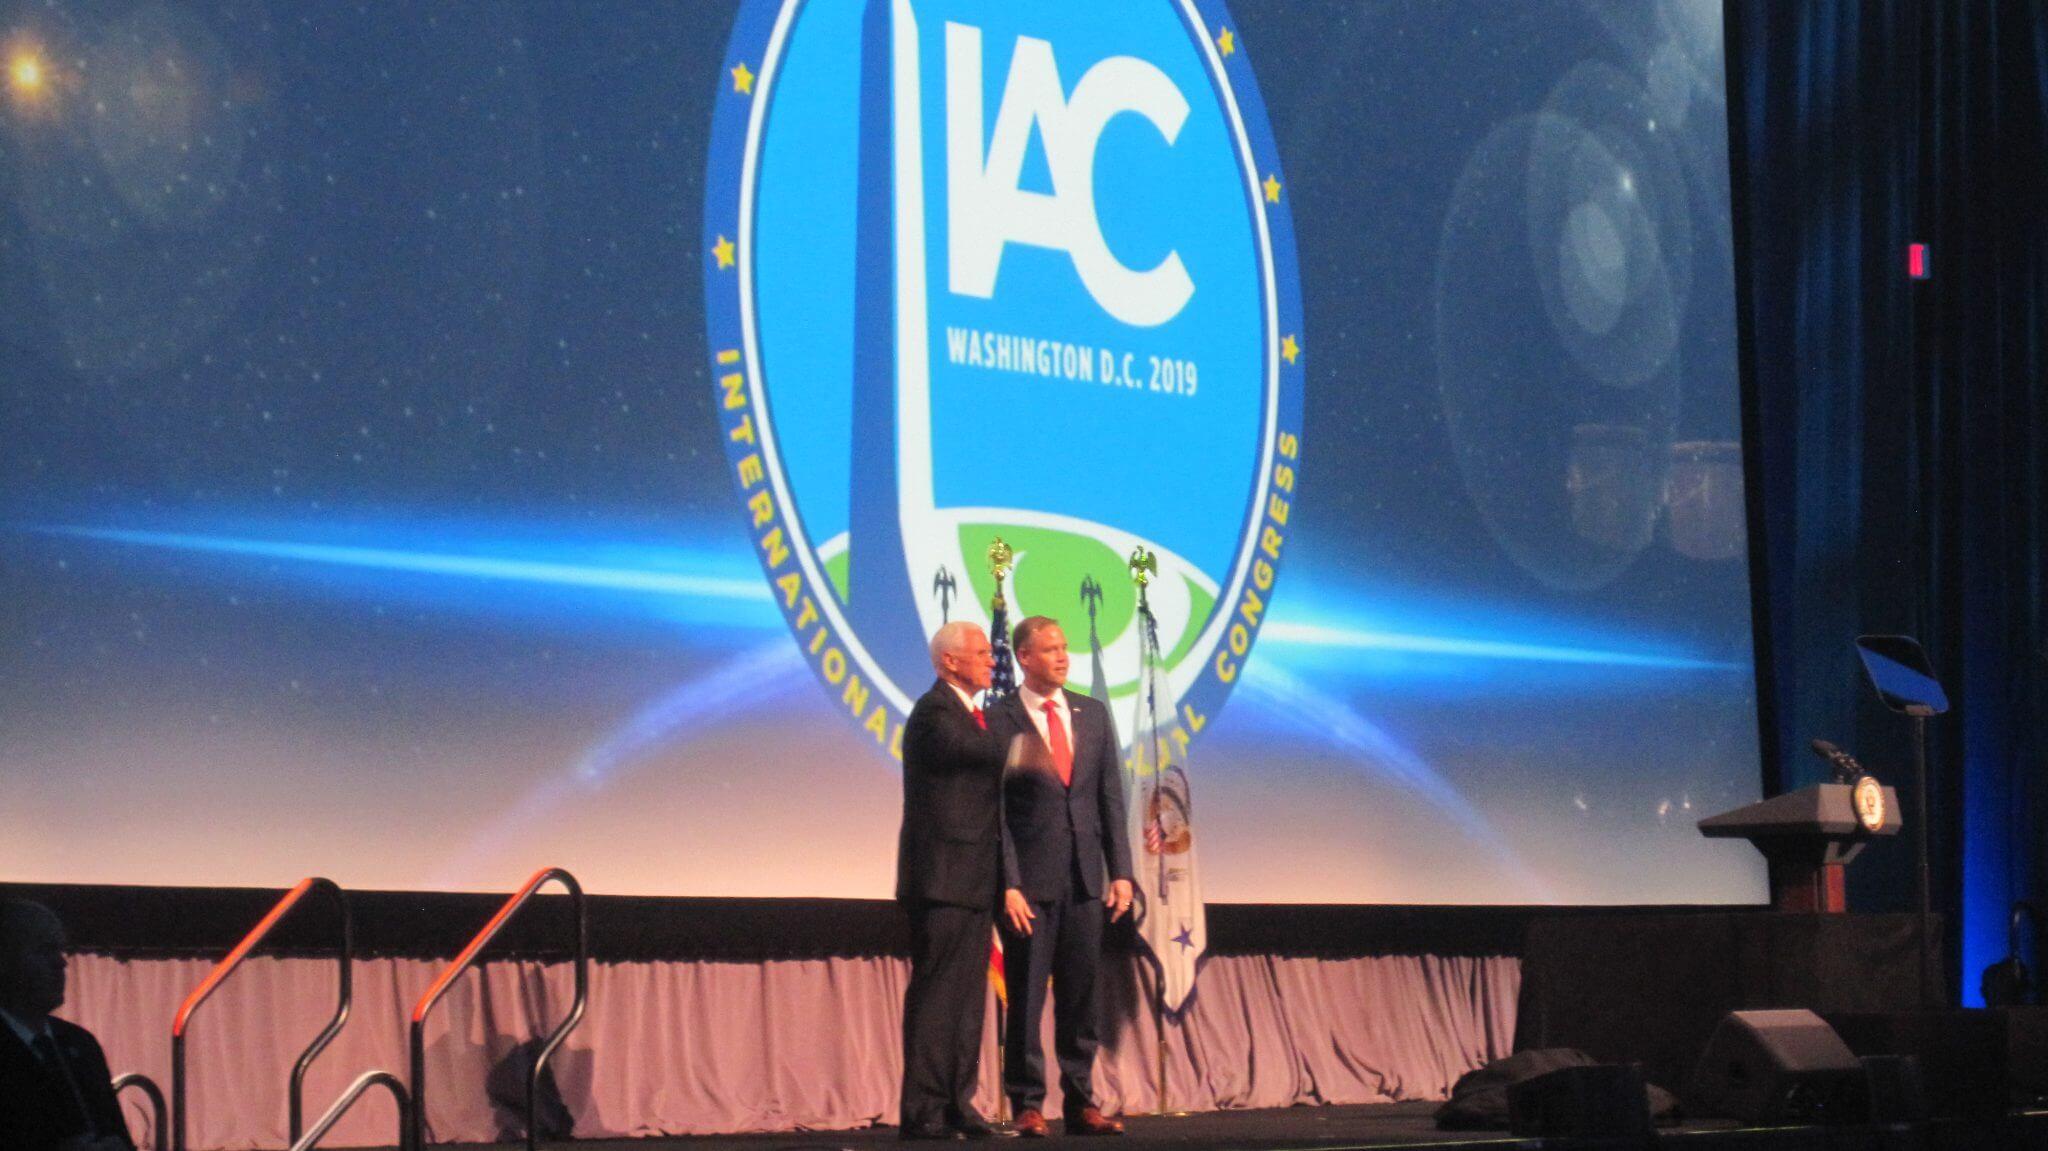 IAC 2019 Washington DC: NASA head Bridenstine diplomatically nods towards cooperation despite choosiness of Trump Administration